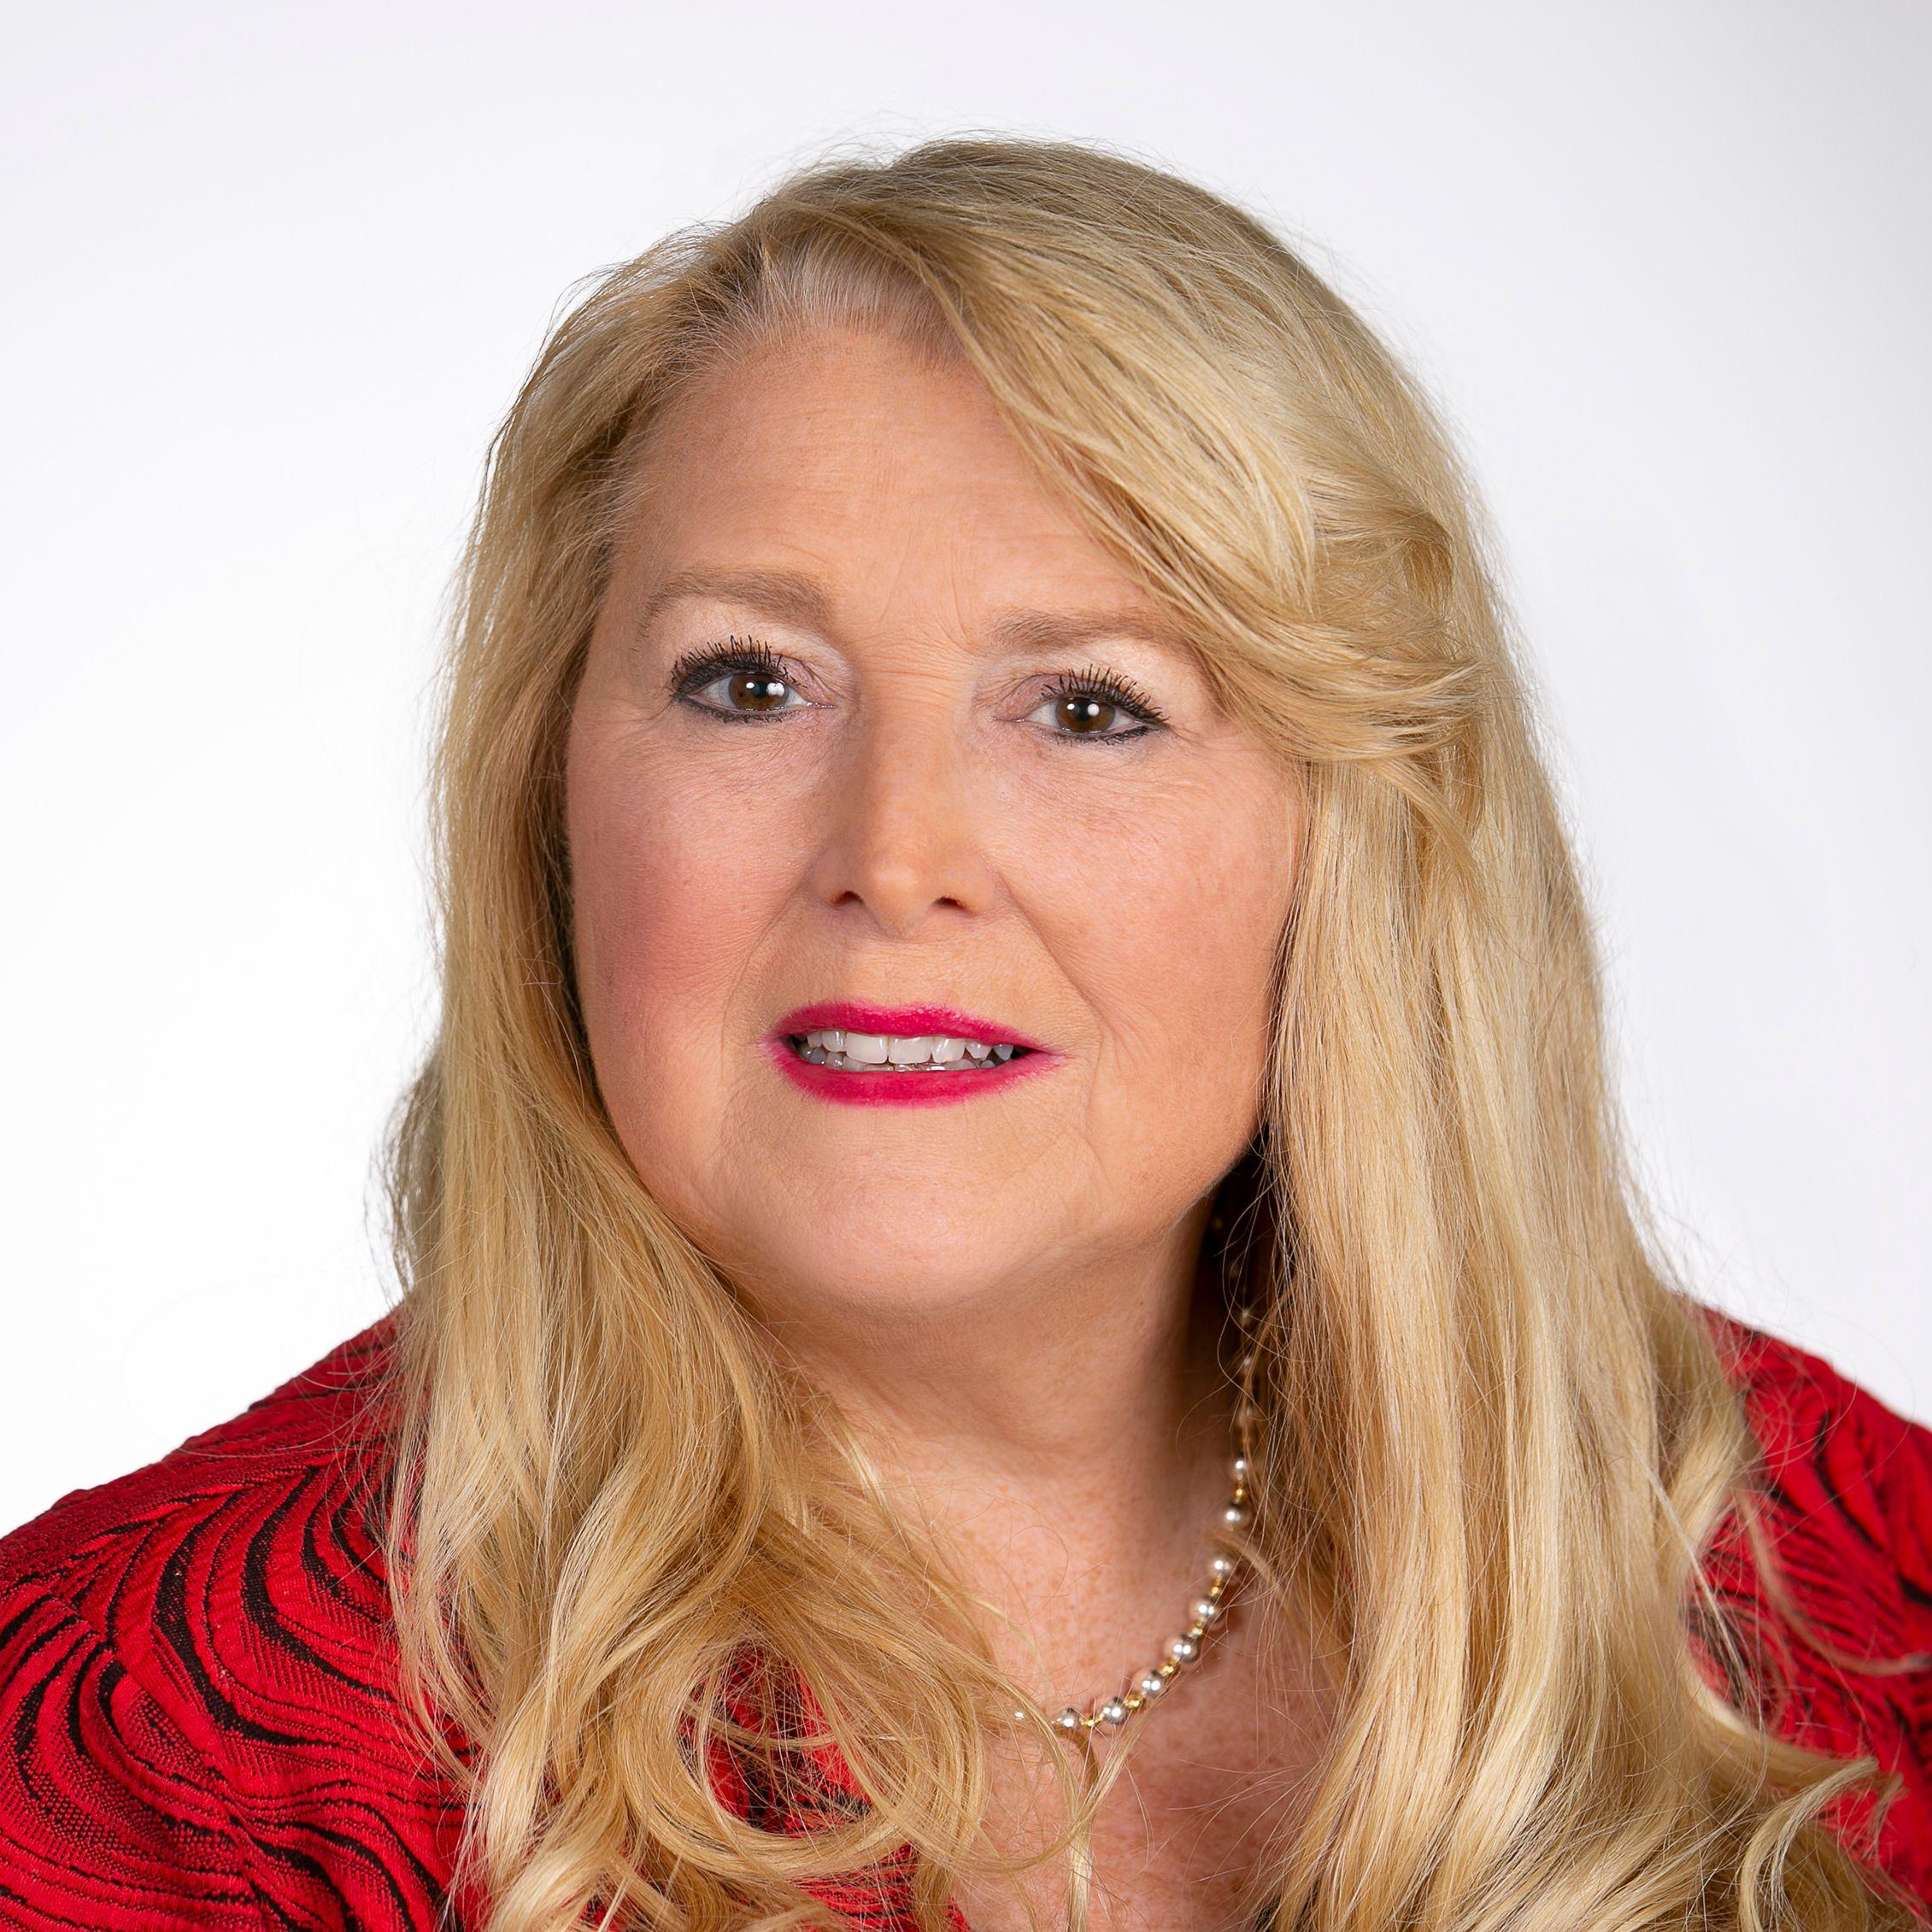 Sharon Correia